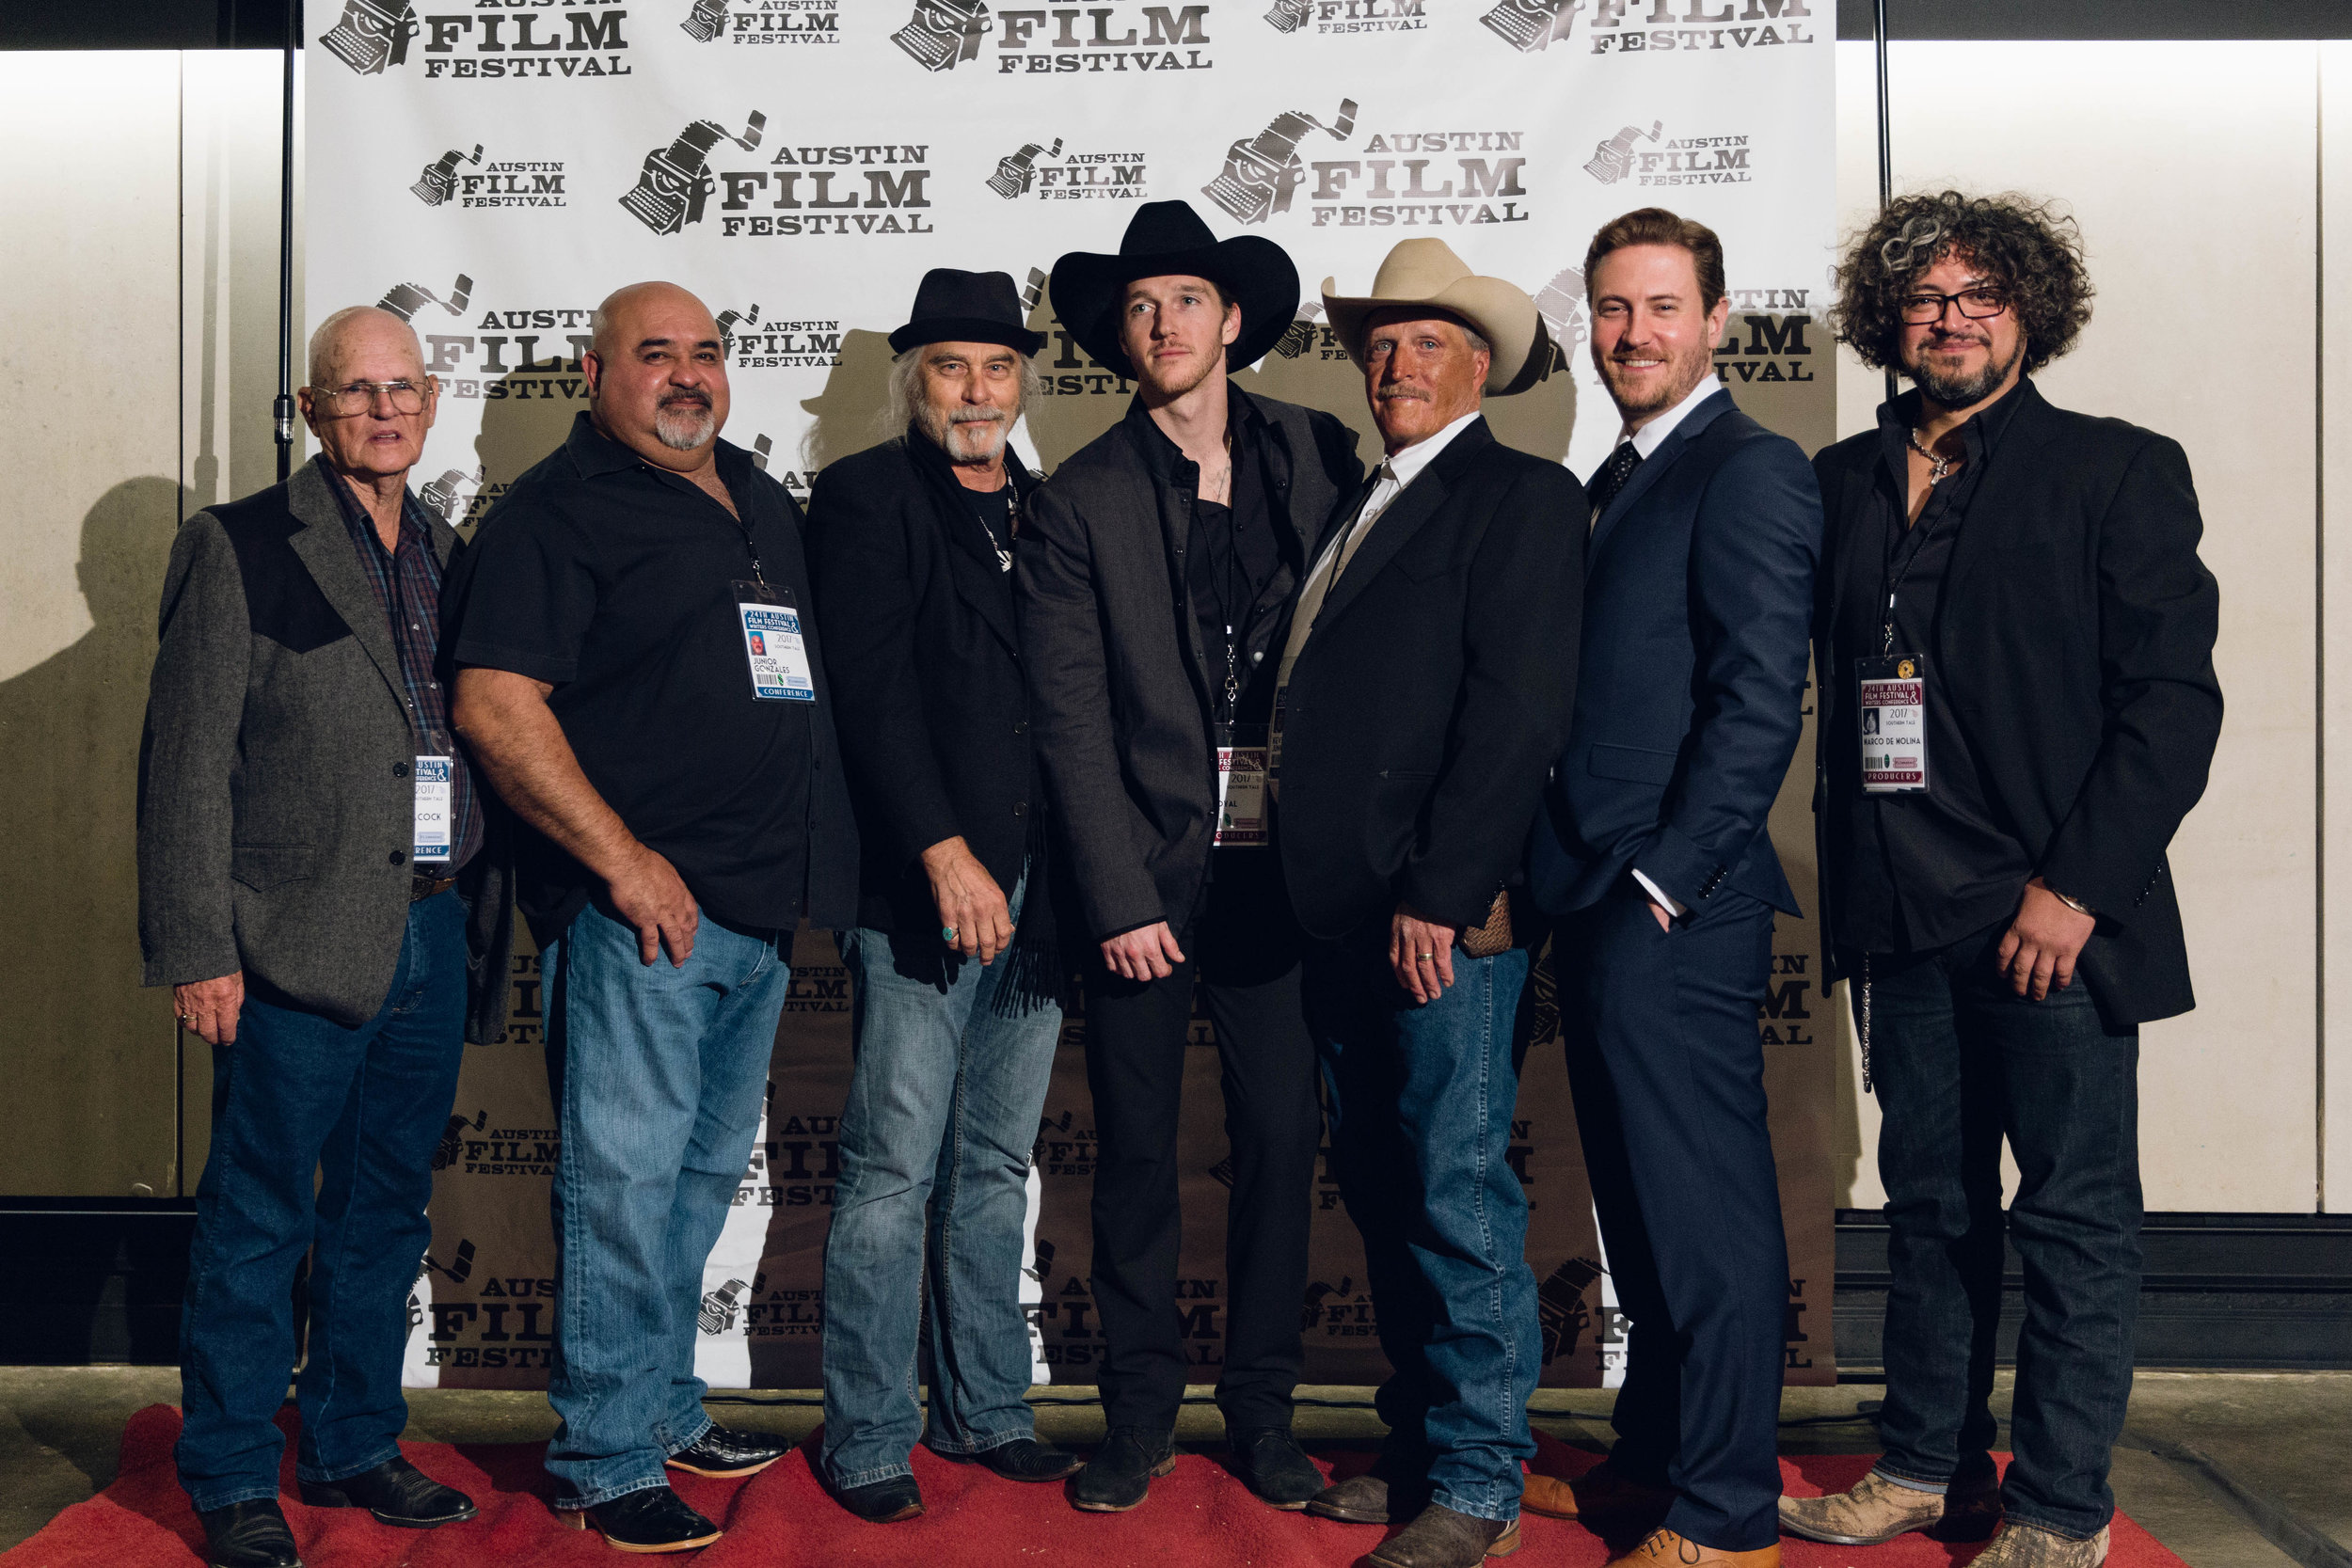 Southern-Tale-Austin-Film-Fest-Kirby-Gladstein-2017-3122.jpg